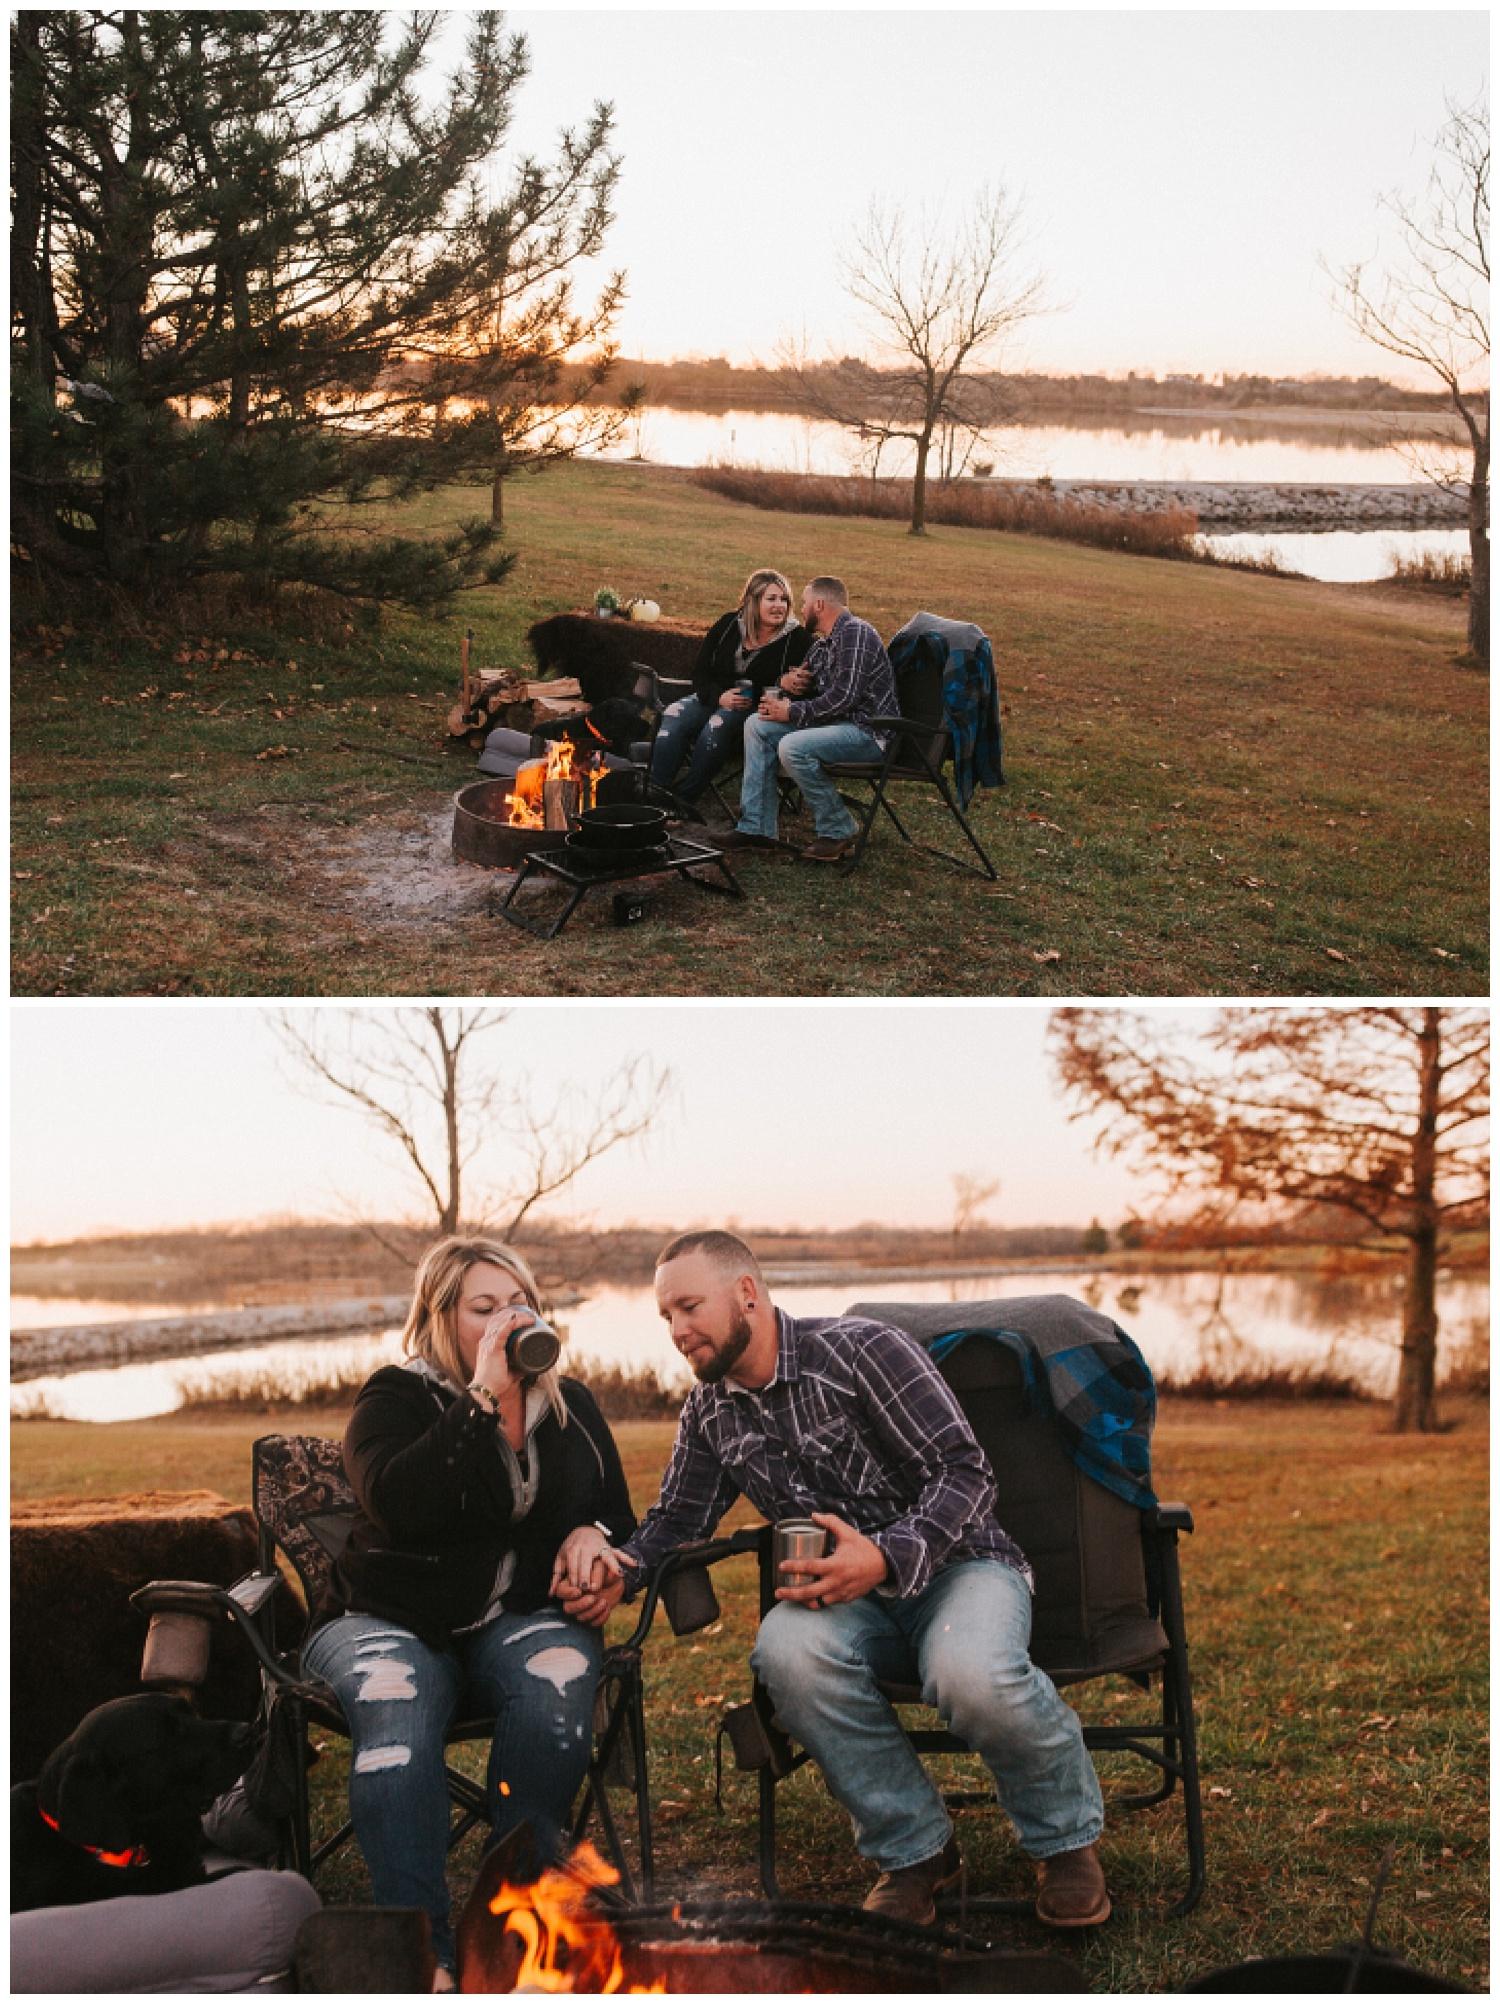 cozy_campfire_campsite_engagement_anniversary_session_nebraska_photographer_haley_chicoine_adventureous_wedding_0027.jpg